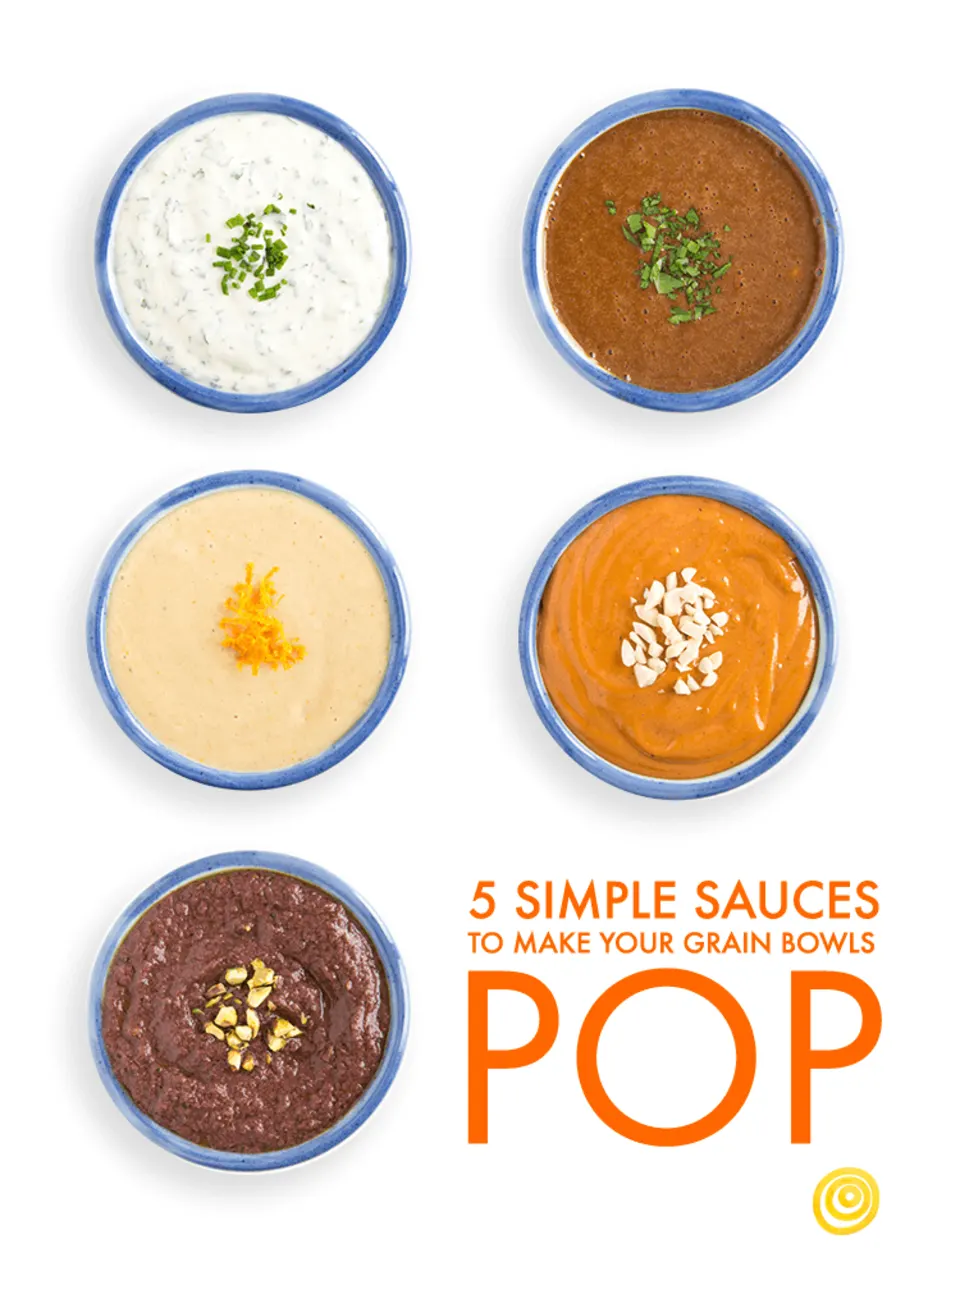 5 Easy Sauces to Make Grain Bowls Pop